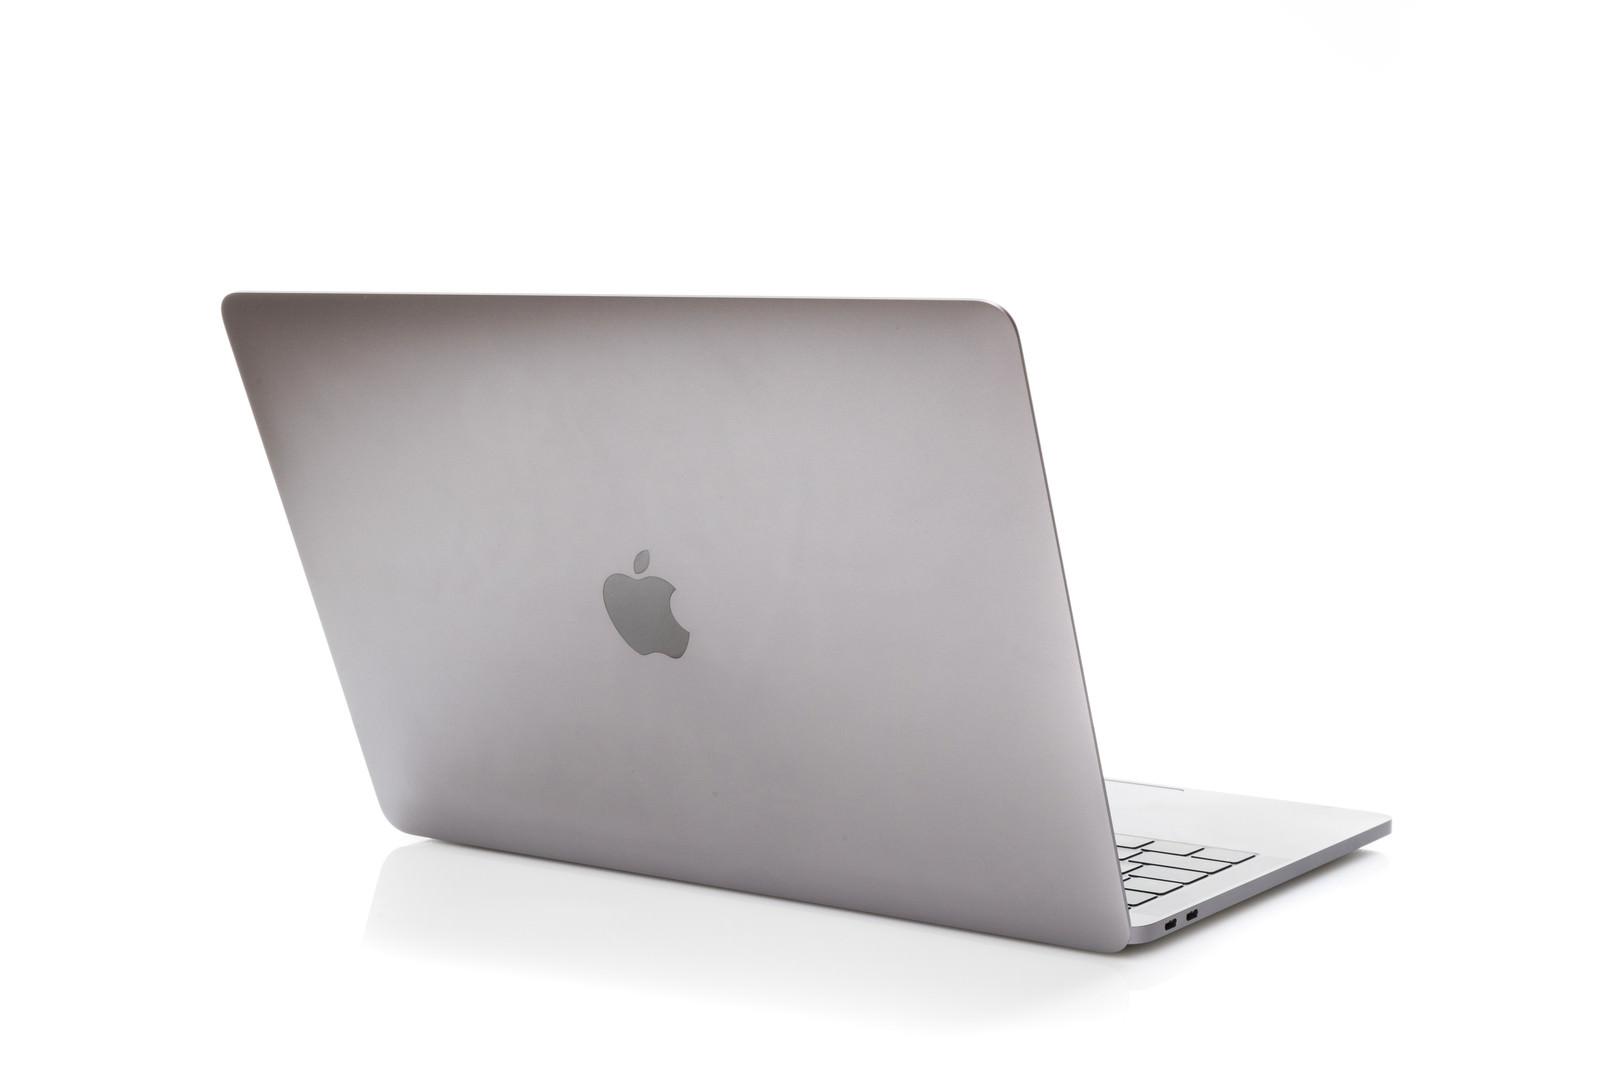 「MacBook Pro13インチ」の写真